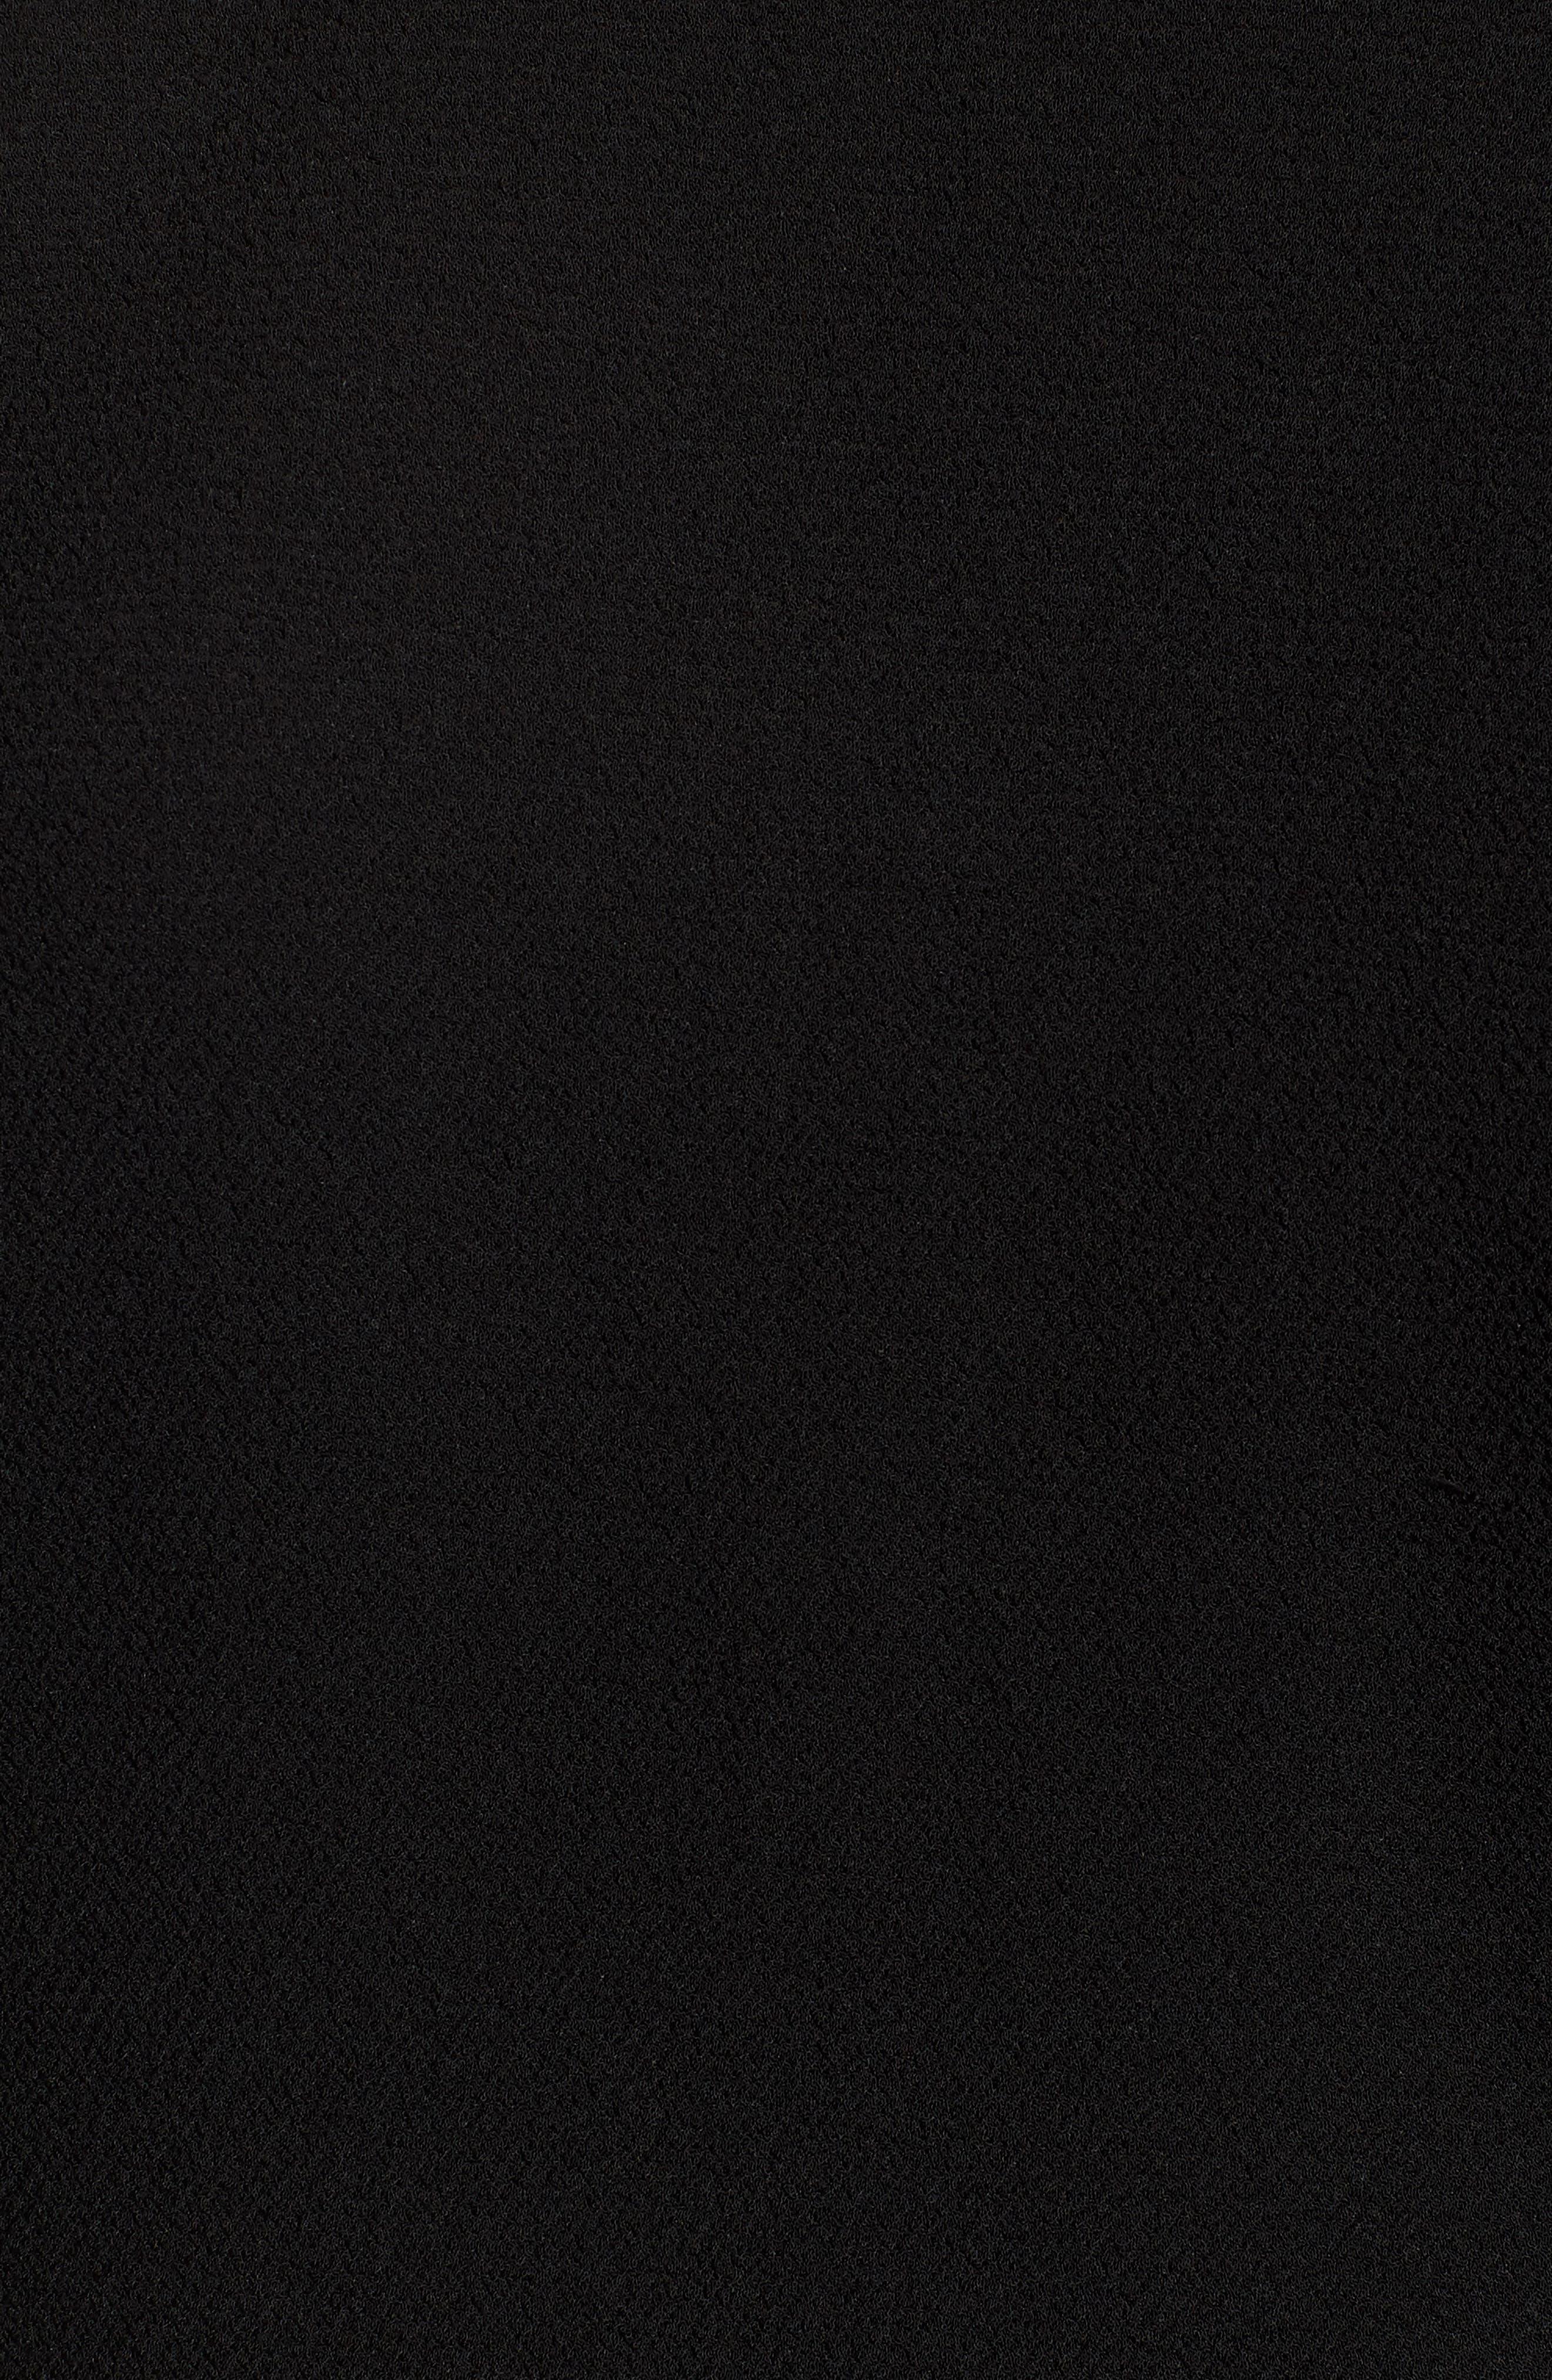 Dolman Sleeve Top,                             Alternate thumbnail 10, color,